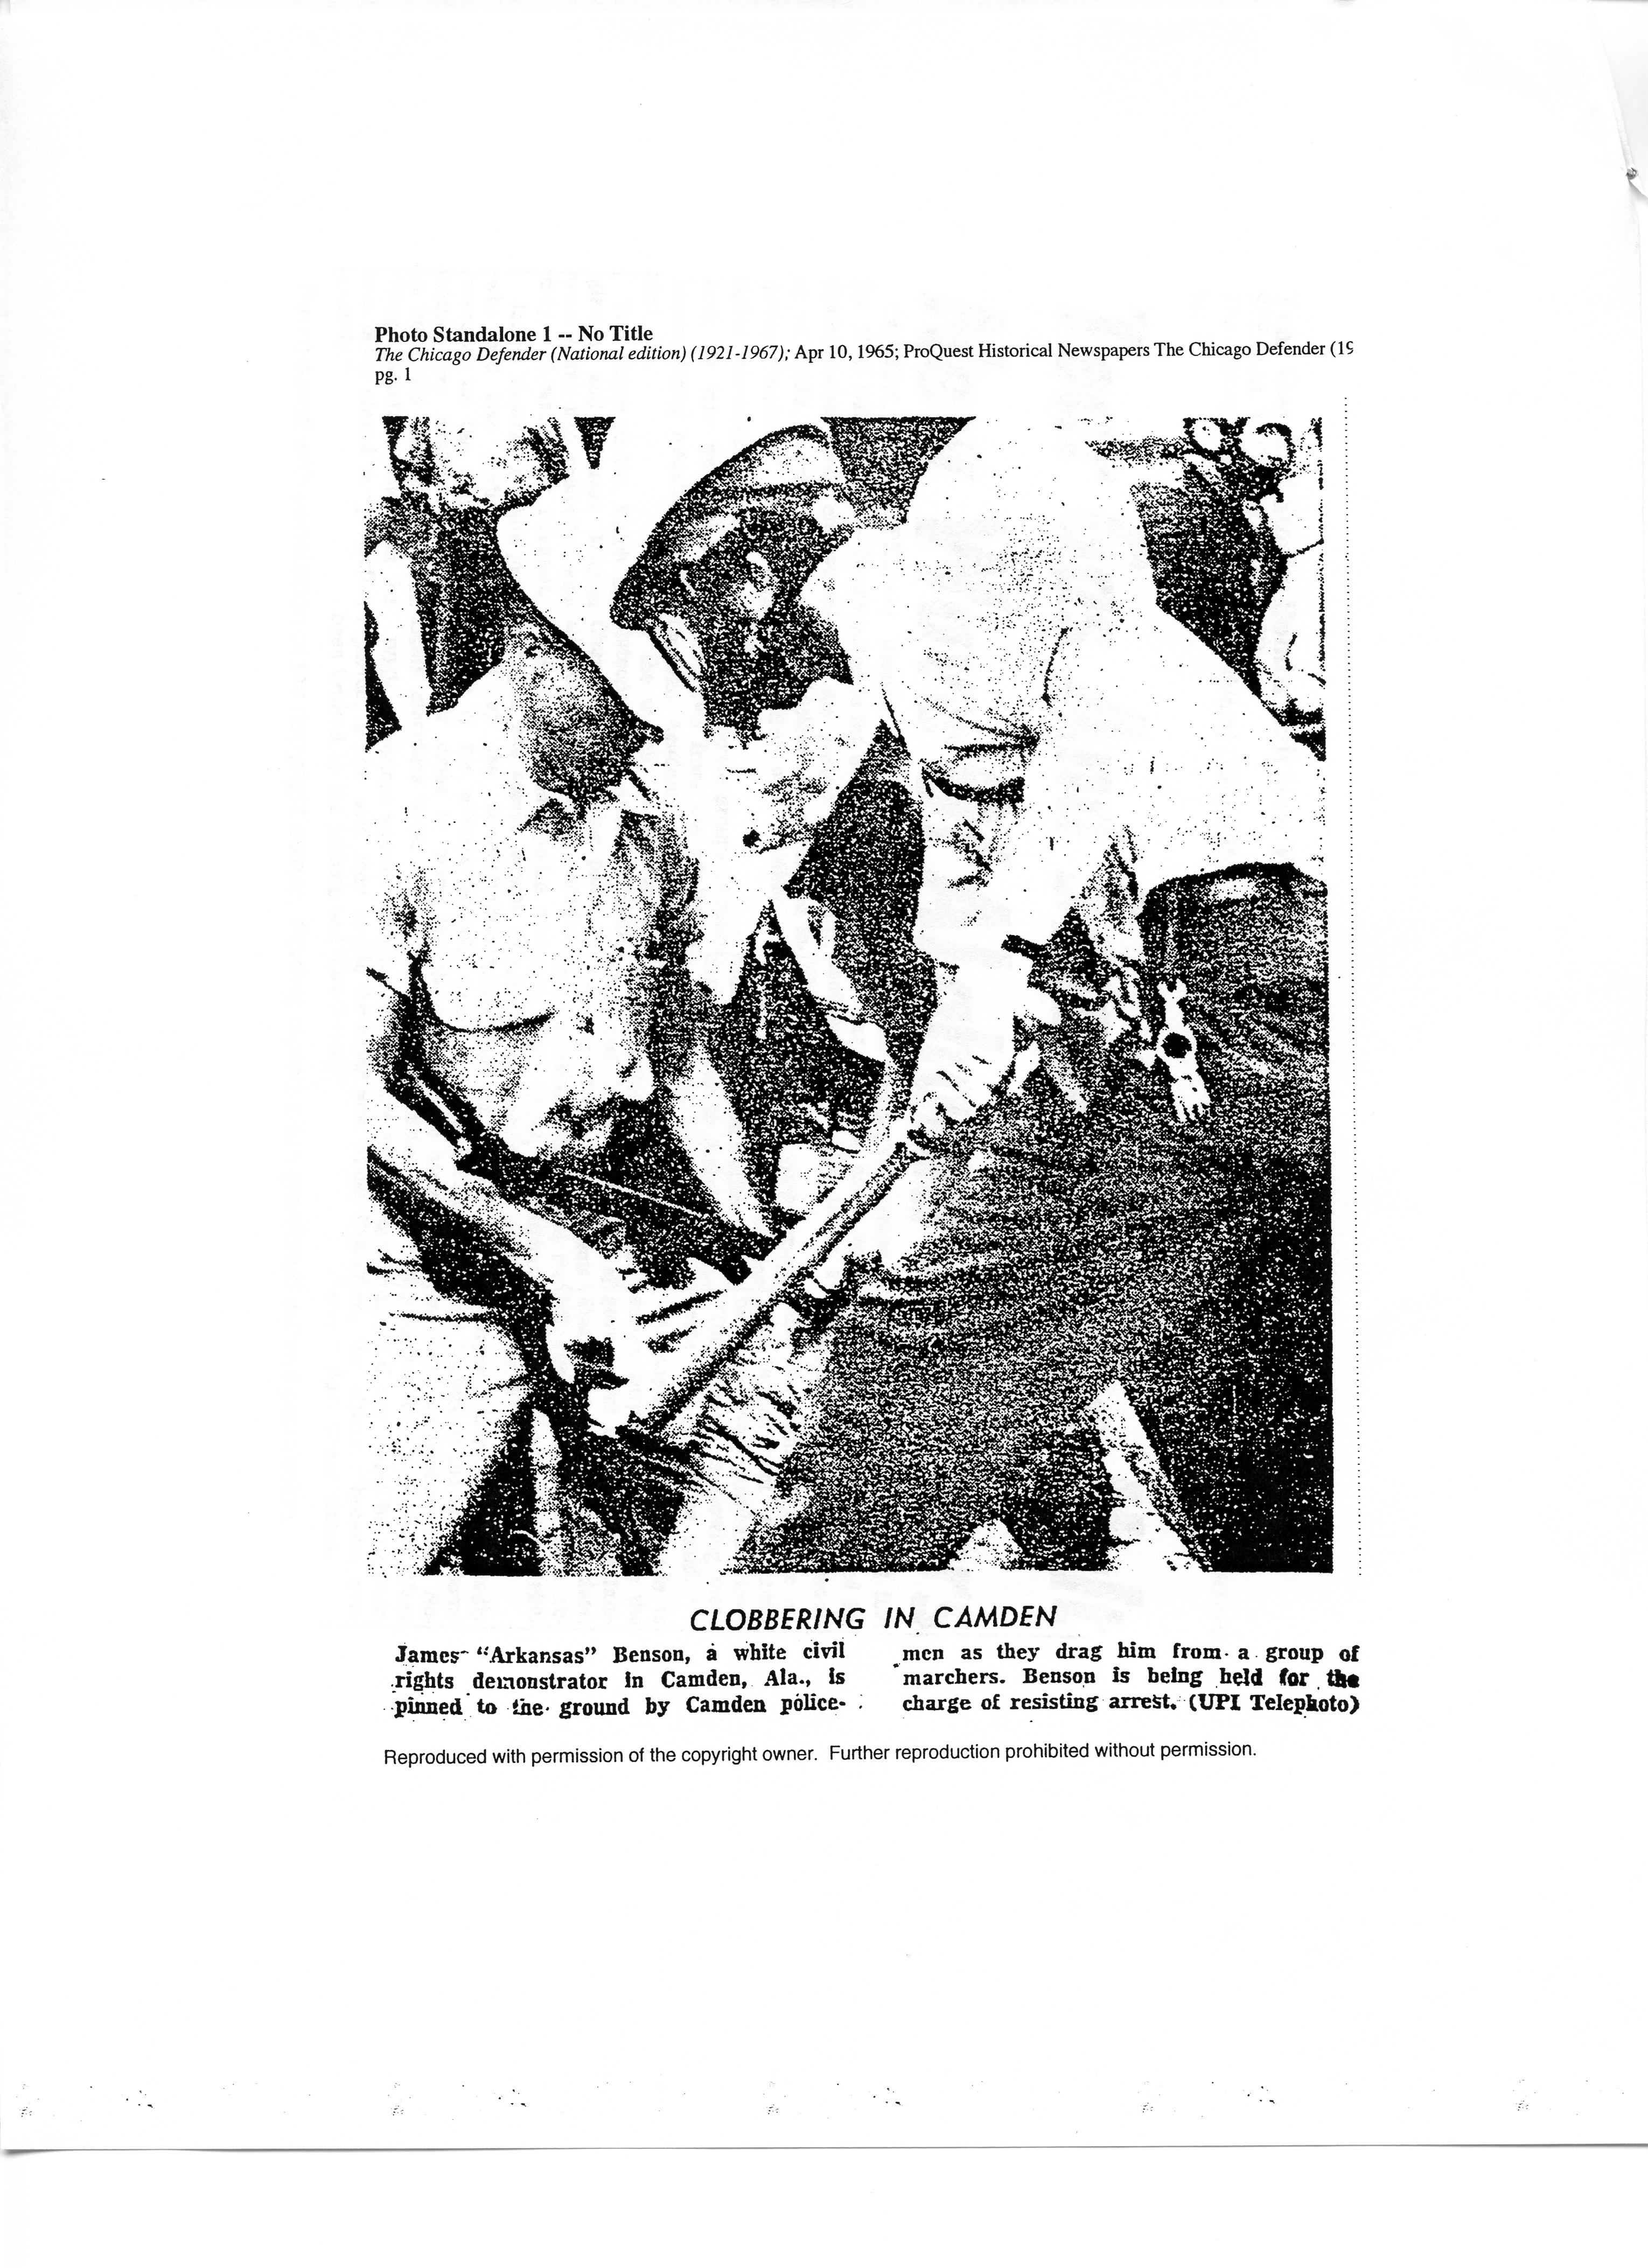 Alabama wilcox county catherine - April 20 1965 Camden Scope056_2